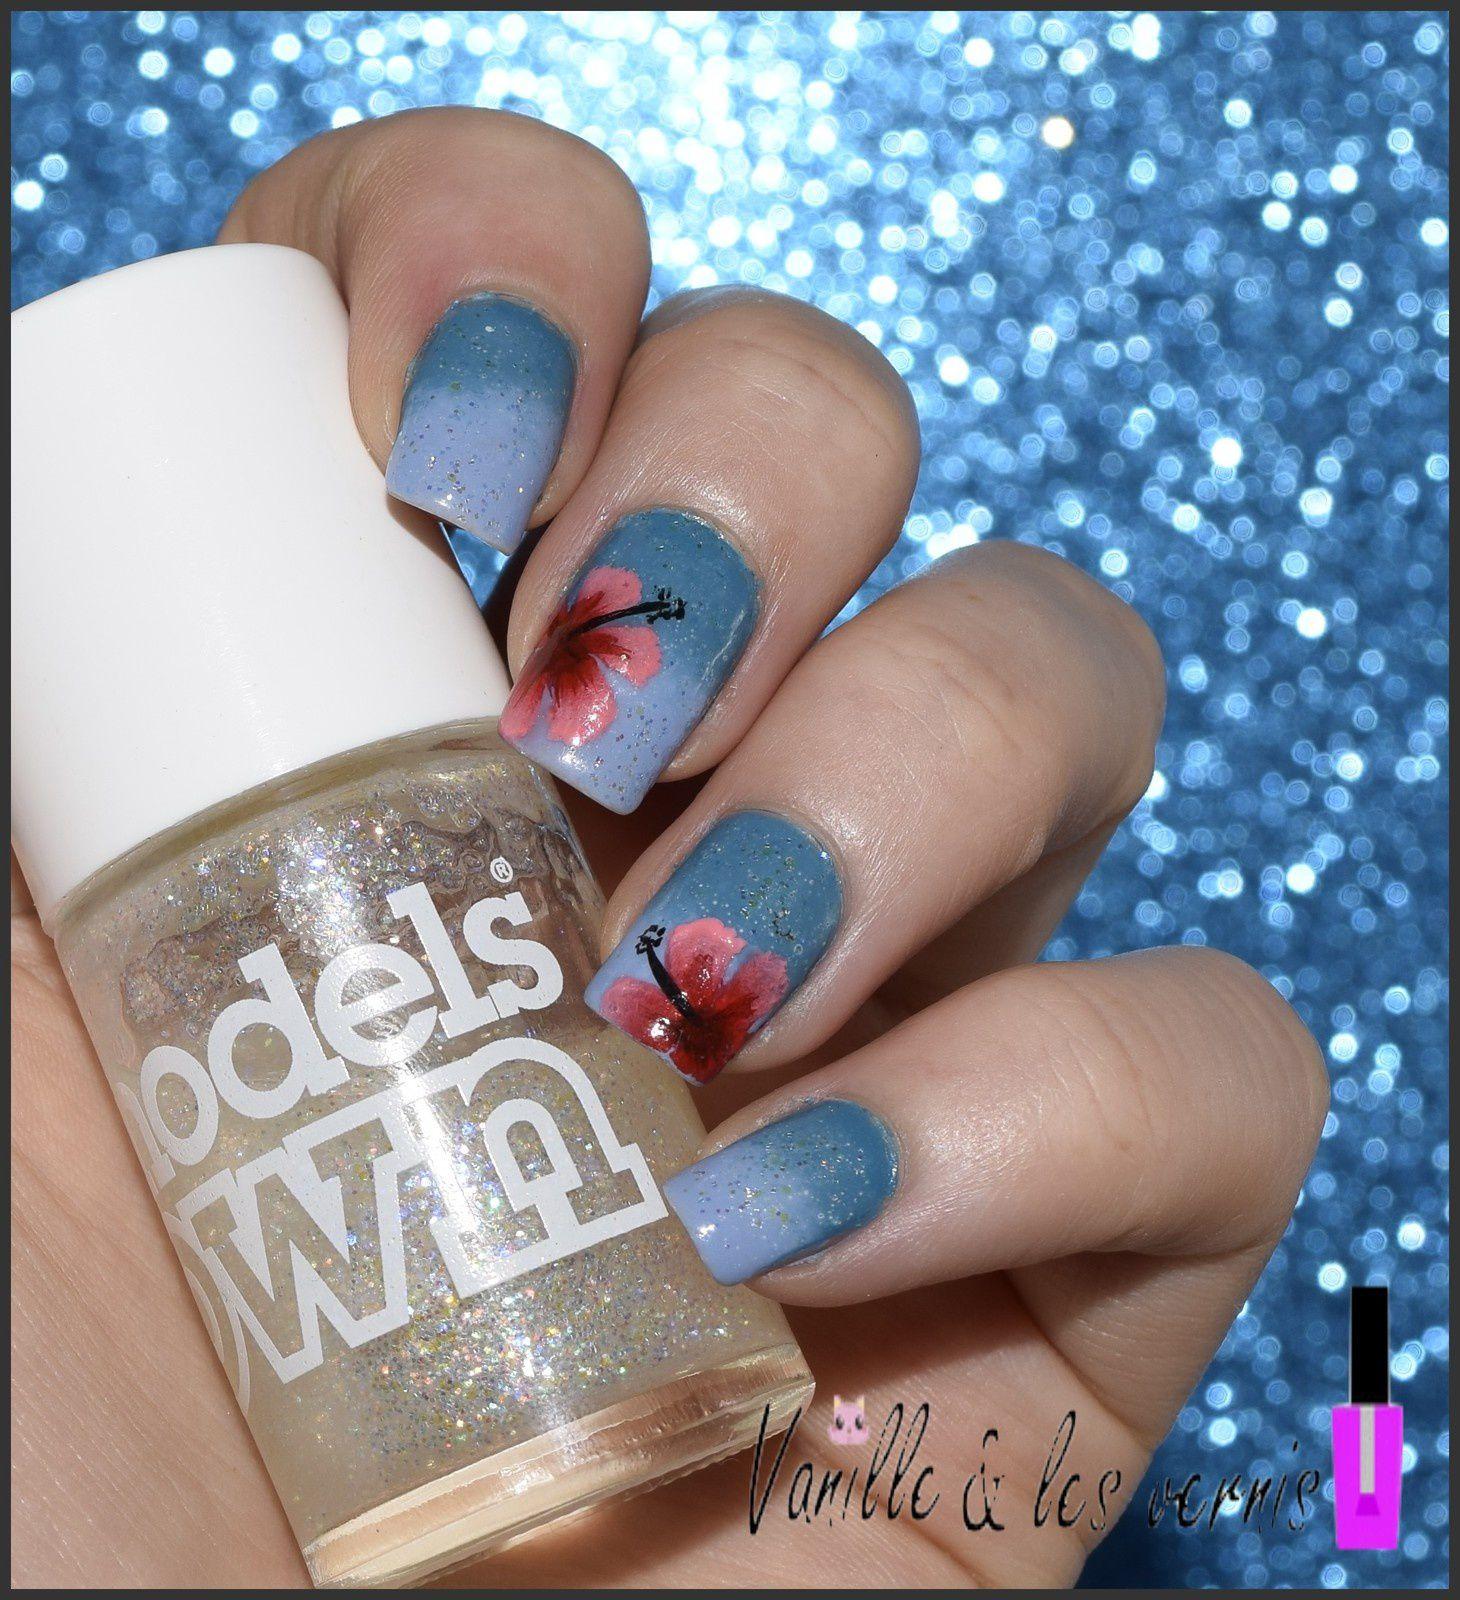 Des hibiscus pour Nail Polish is Peachy^^